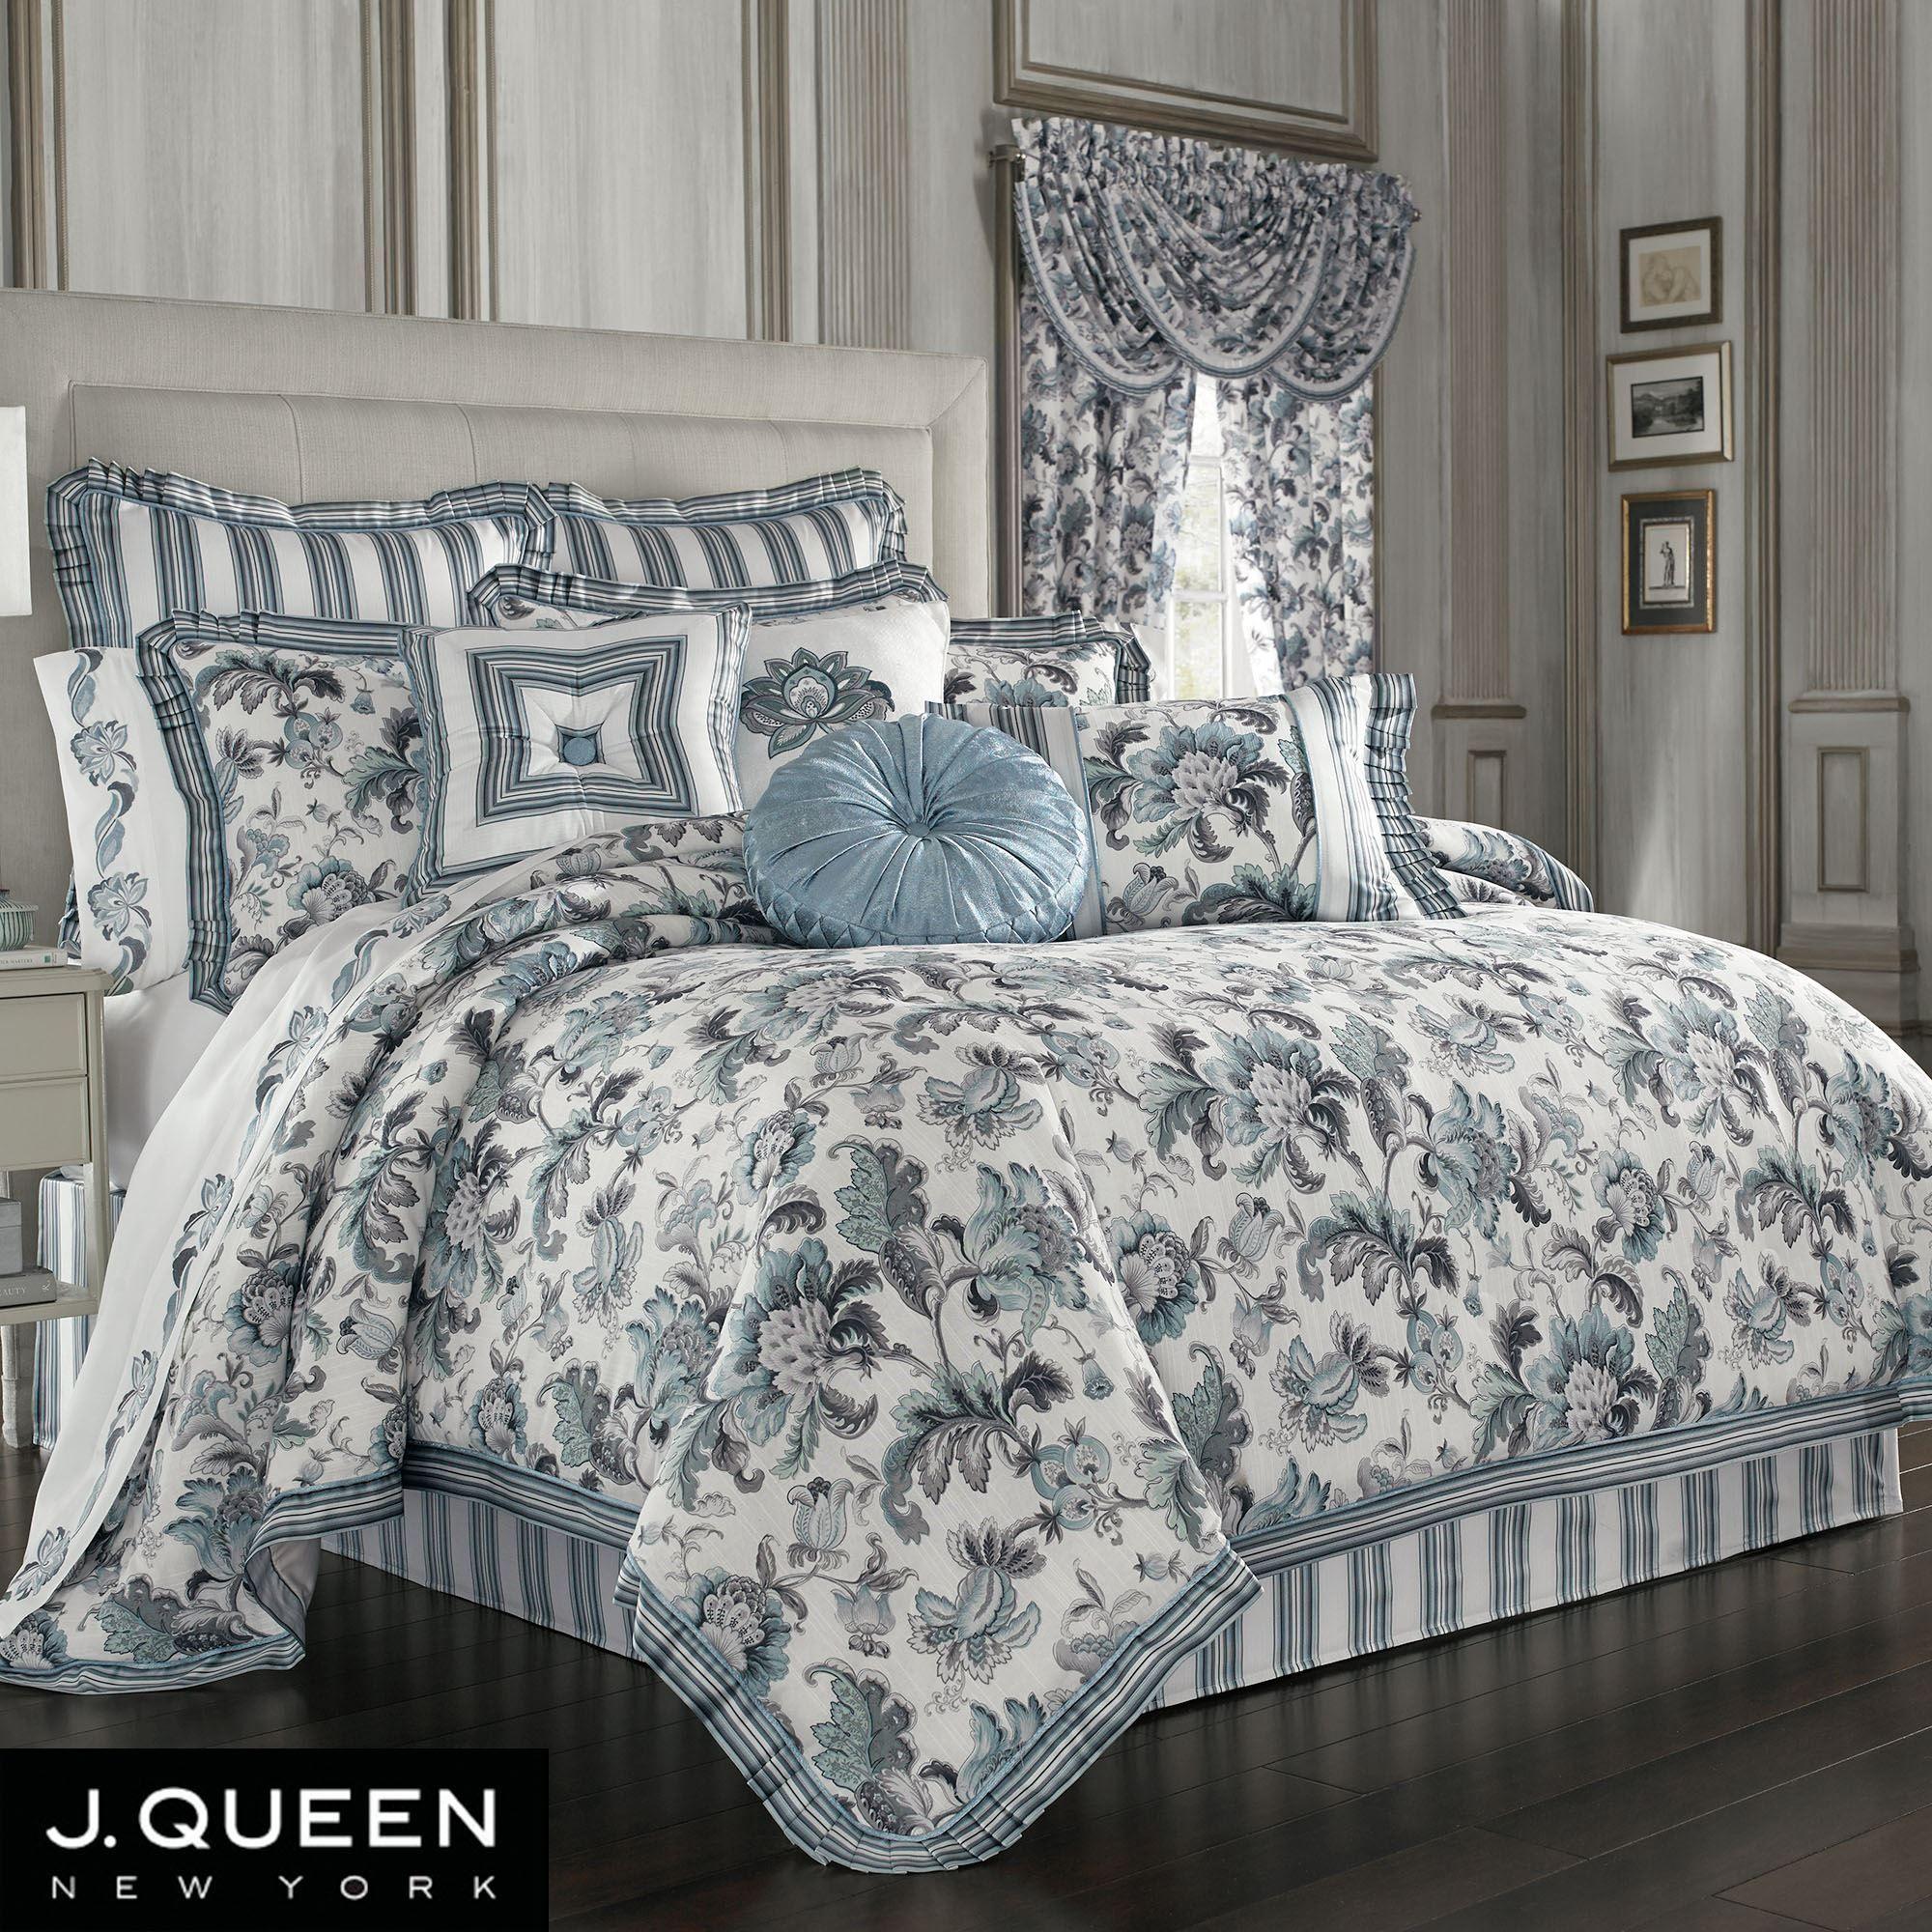 Atrium Jacobean Floral Comforter Bedding By J Queen New York